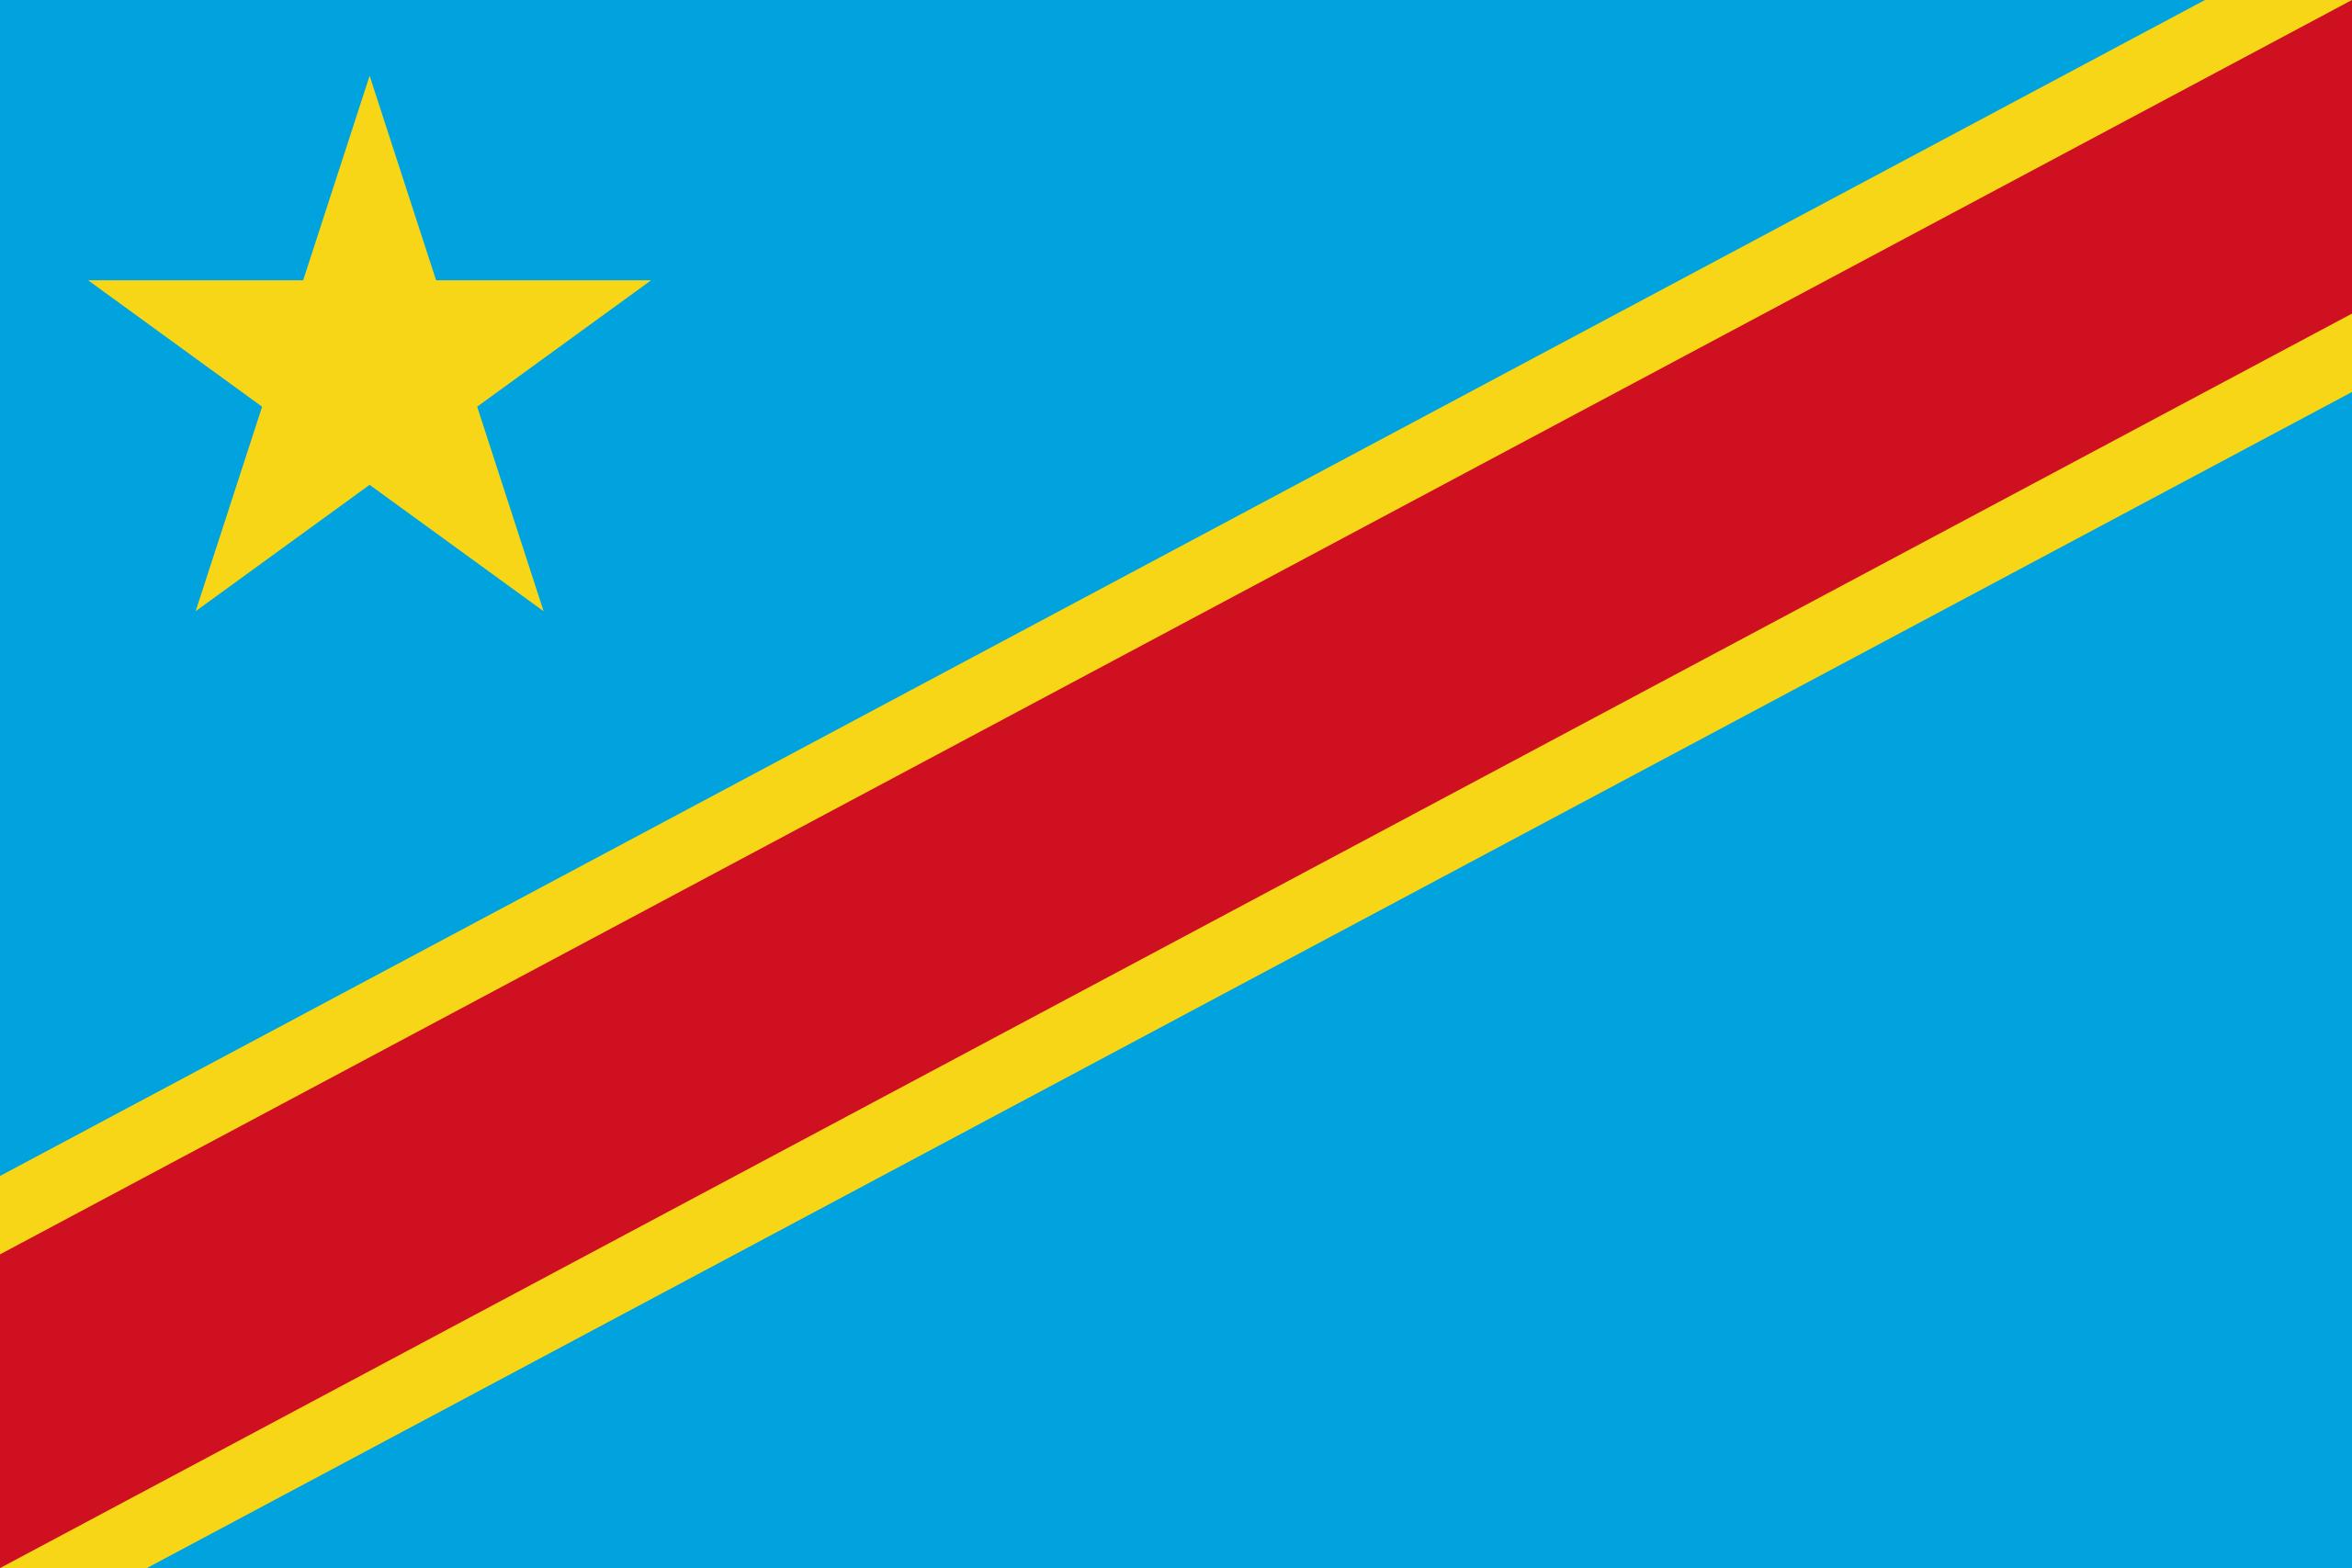 Flagge von Kongo